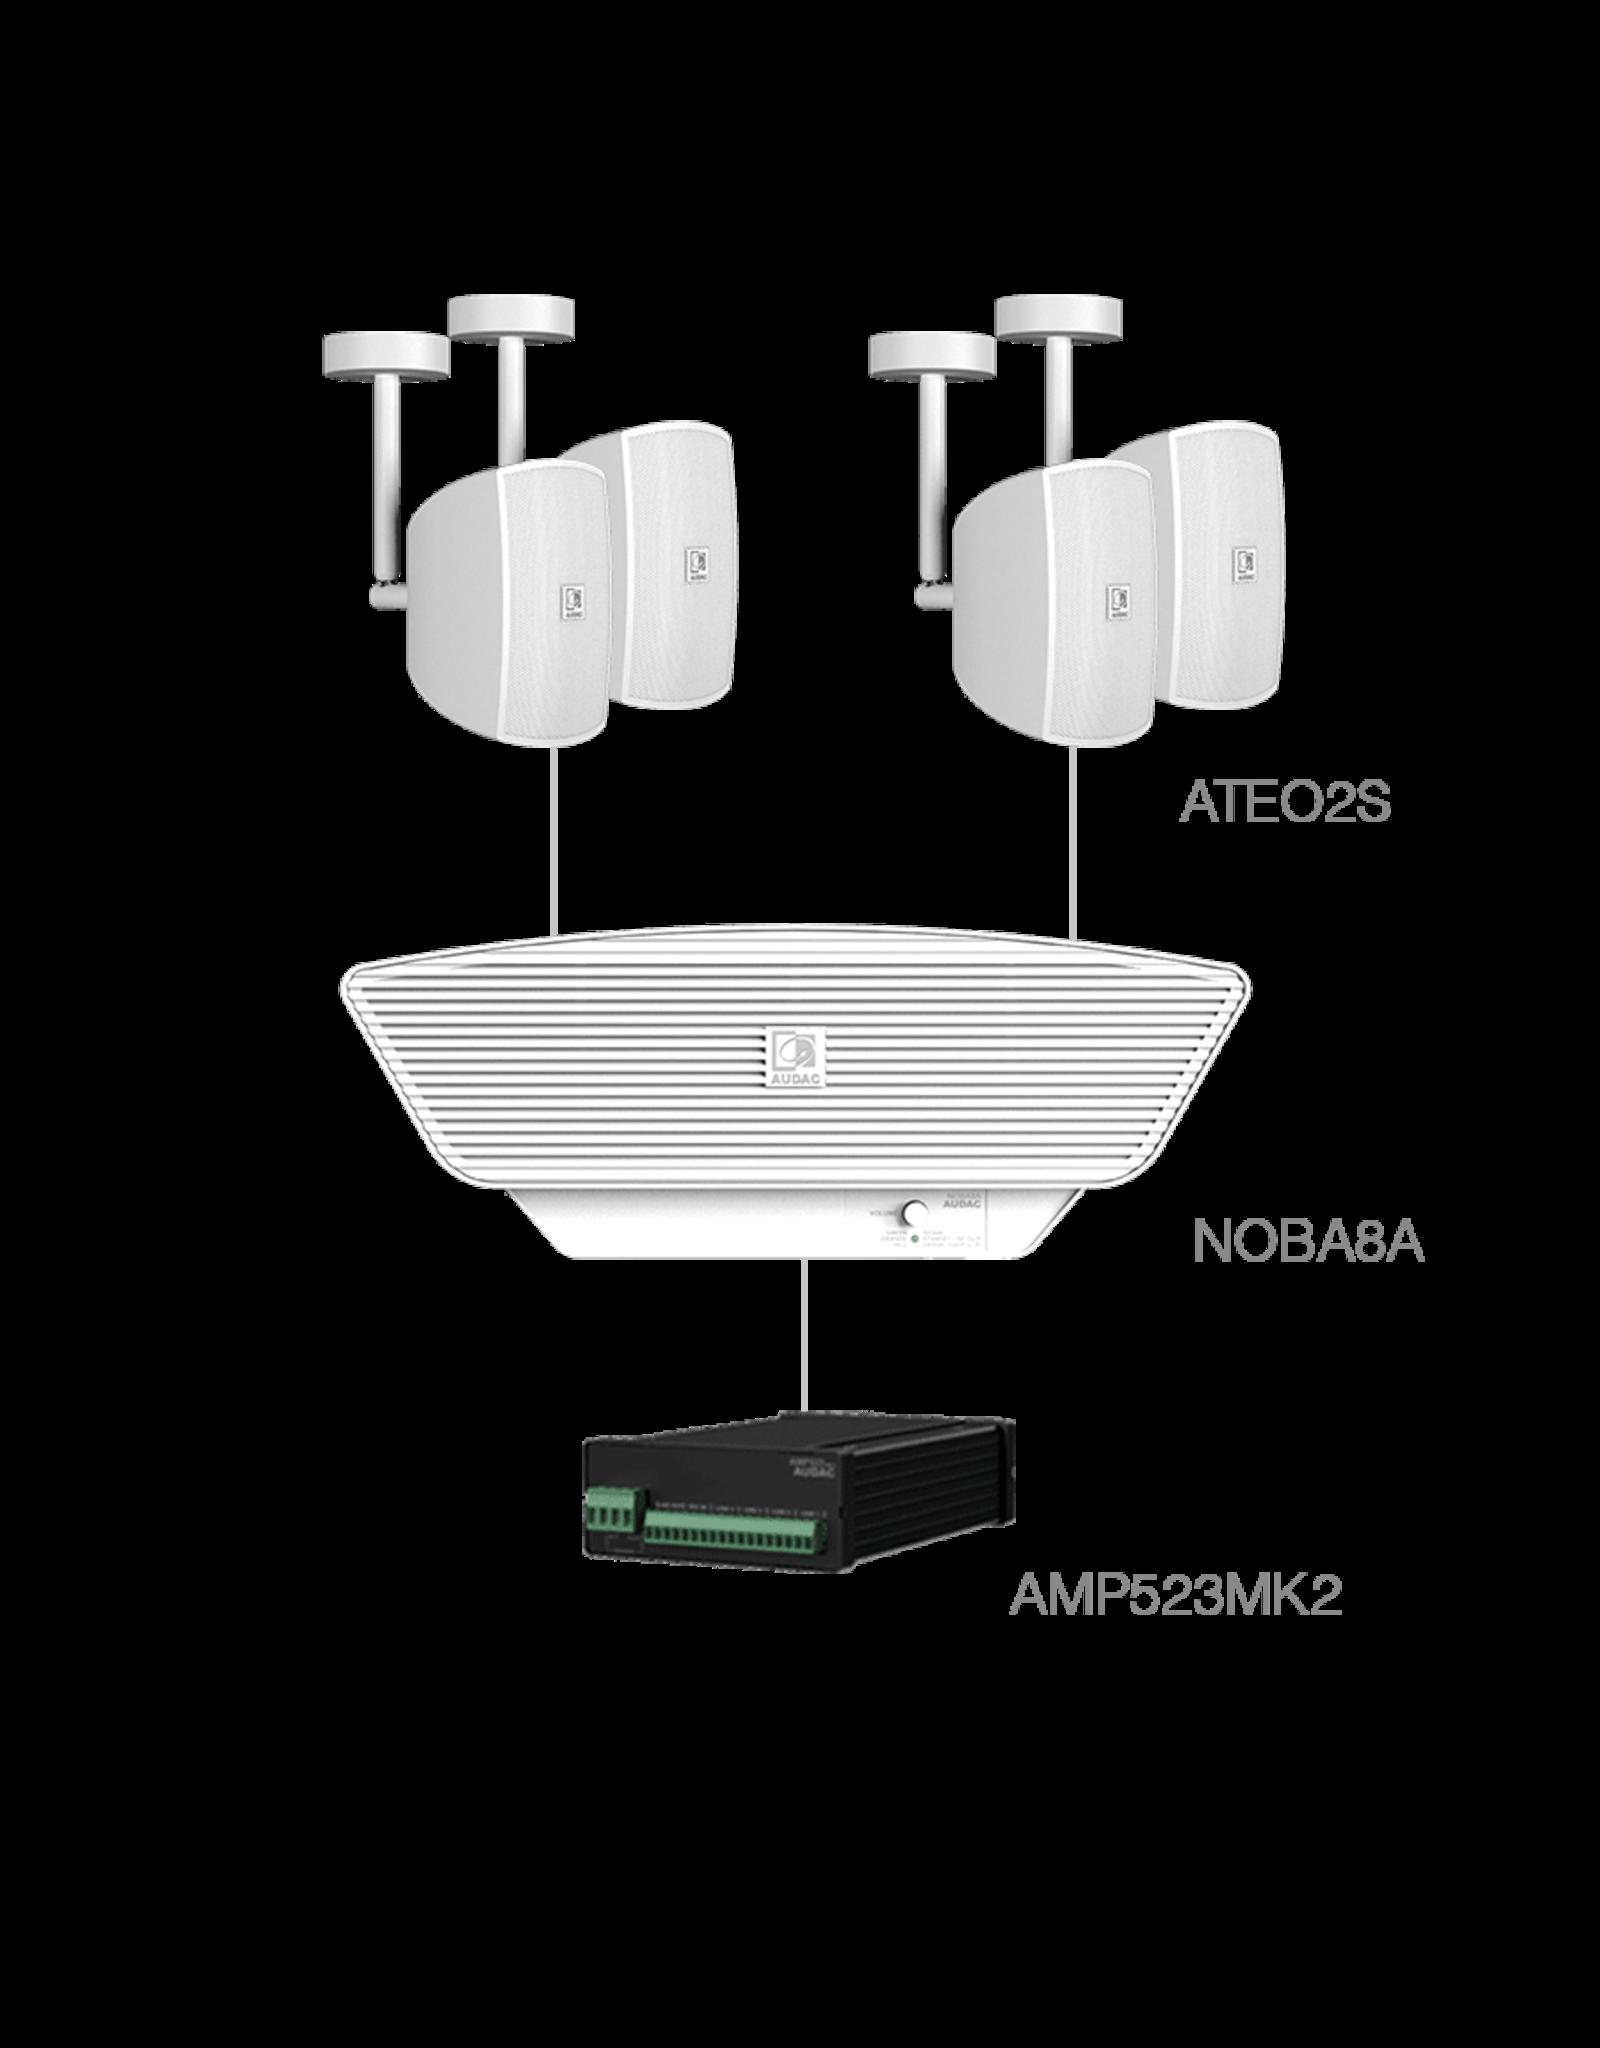 Audac 4x ATEO2S + NOBA8A + AMP523MK2 White